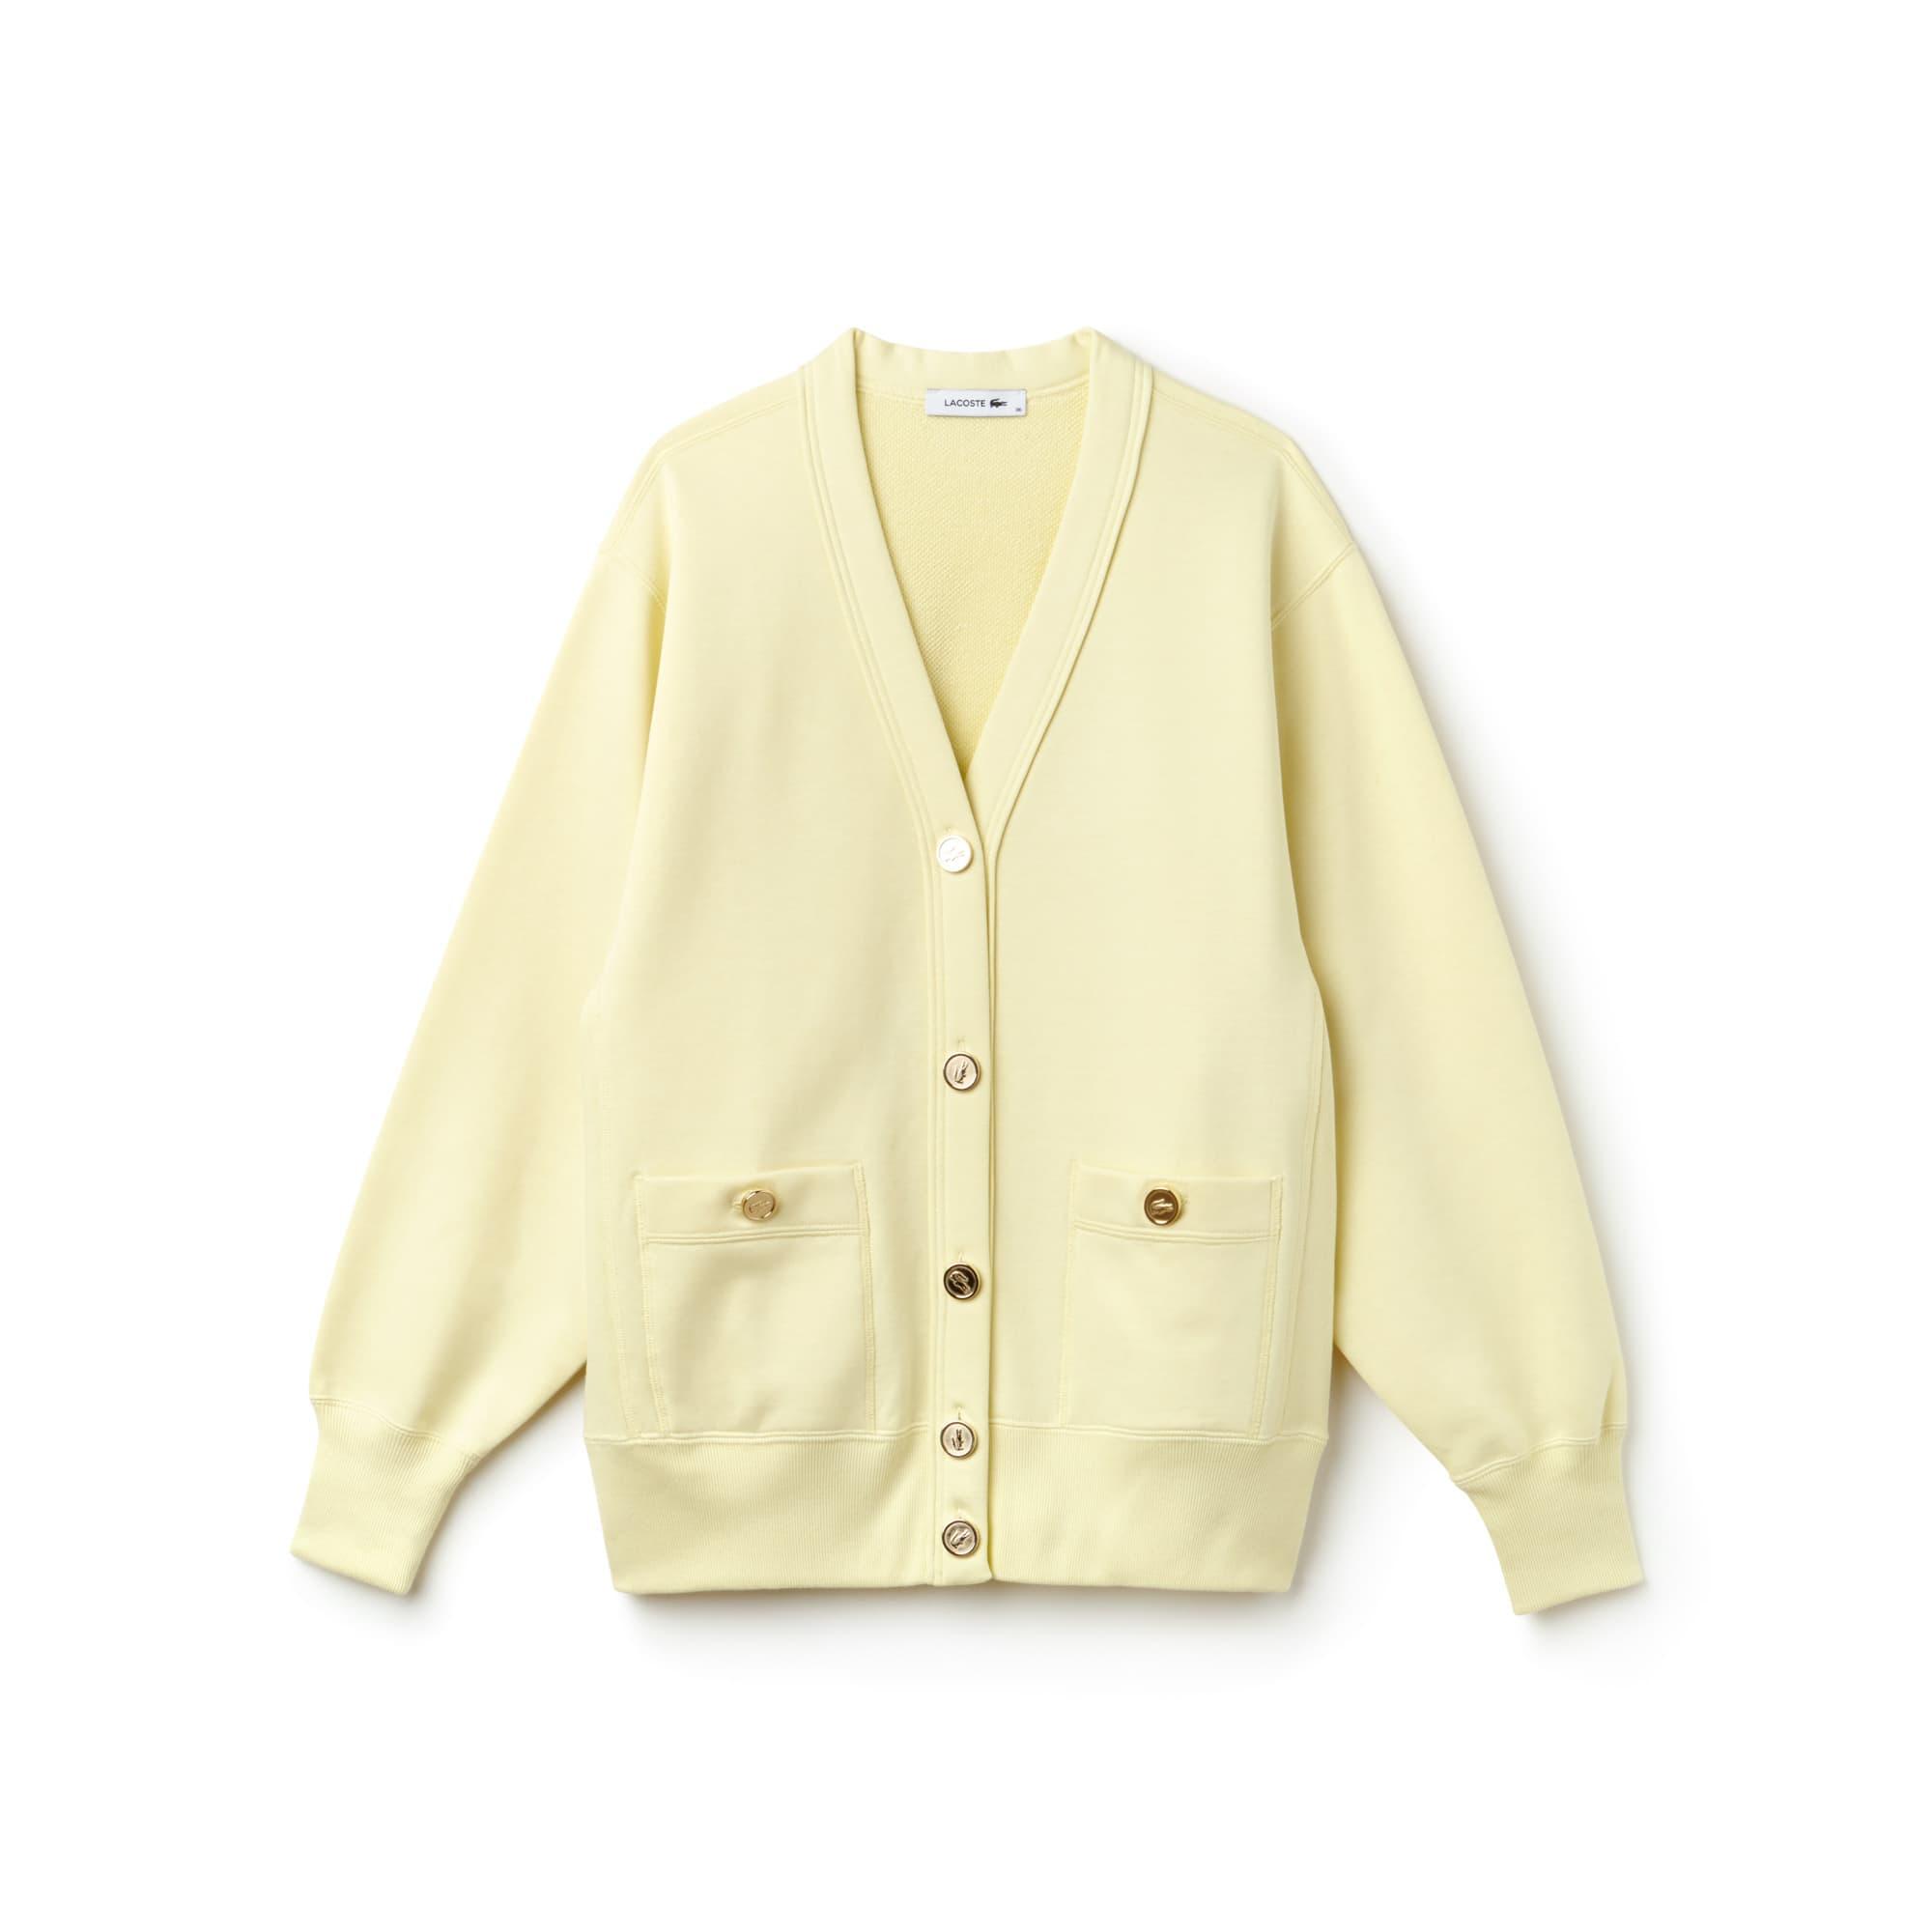 Damen Fashion Show Cardigan aus Baumwoll-Fleece